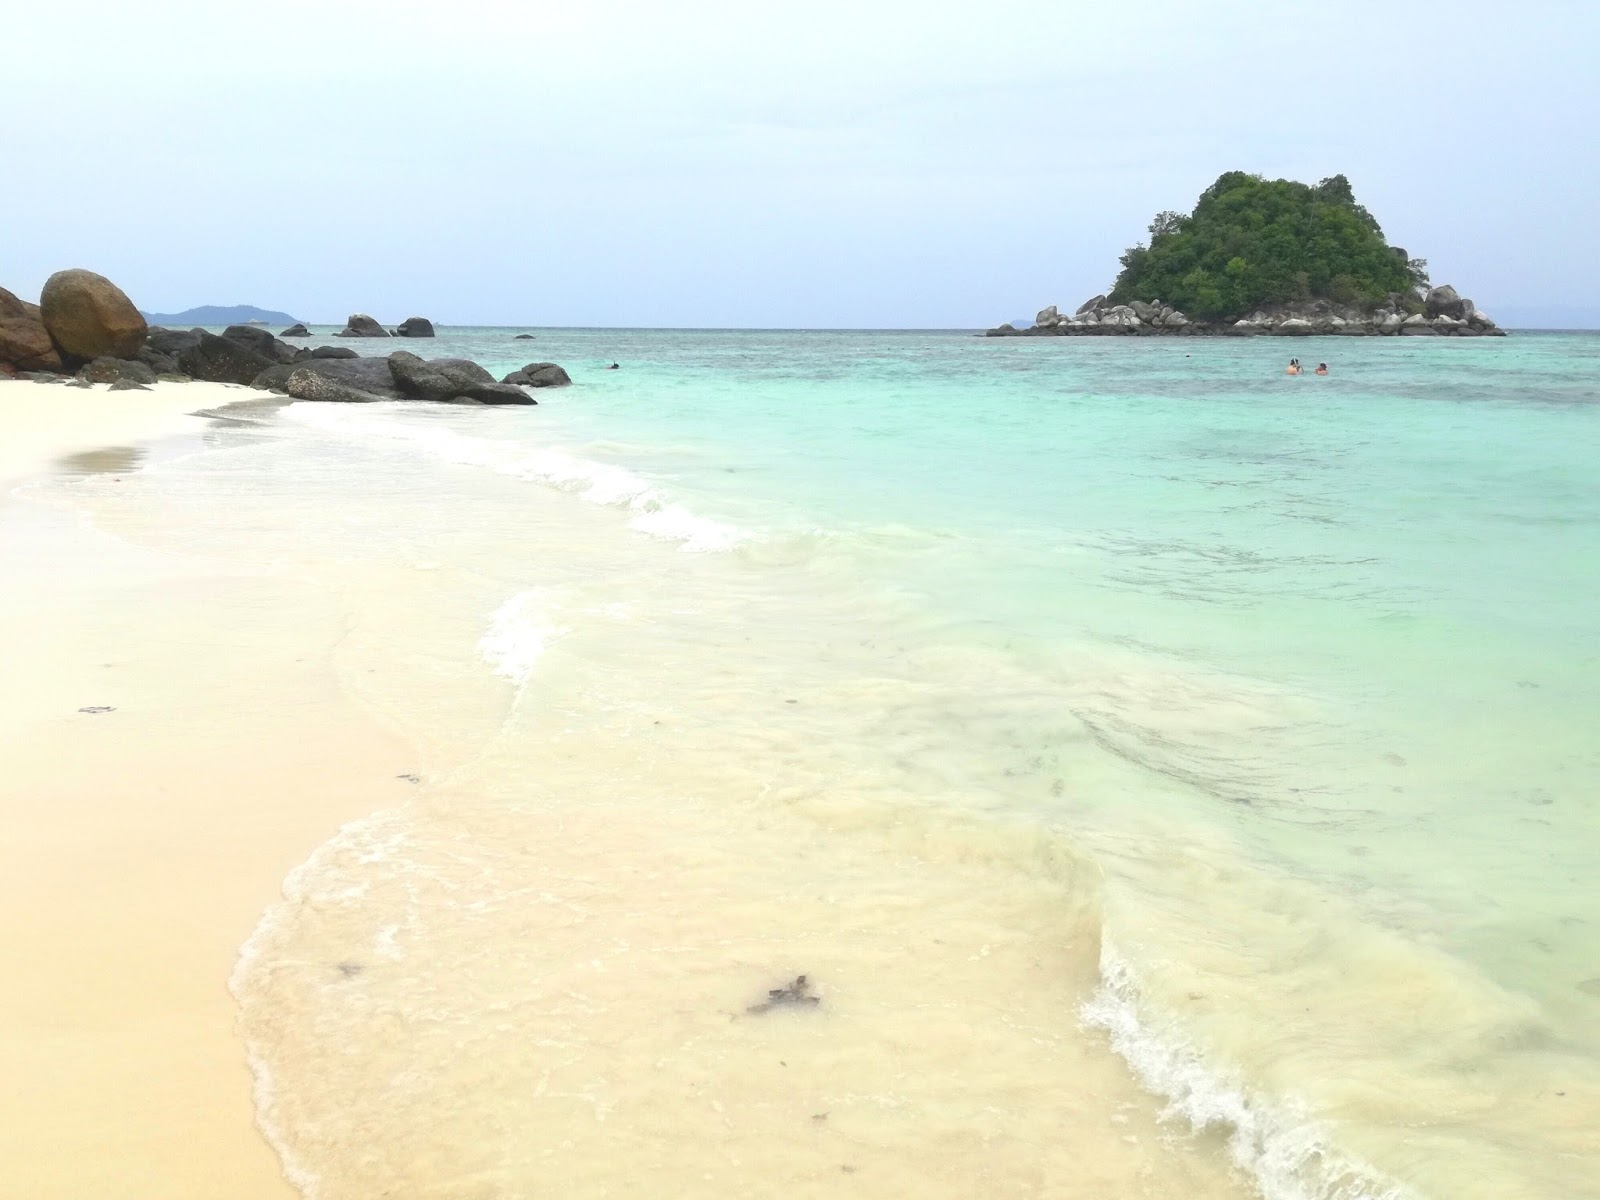 sunrise beach ko lipe thailandia